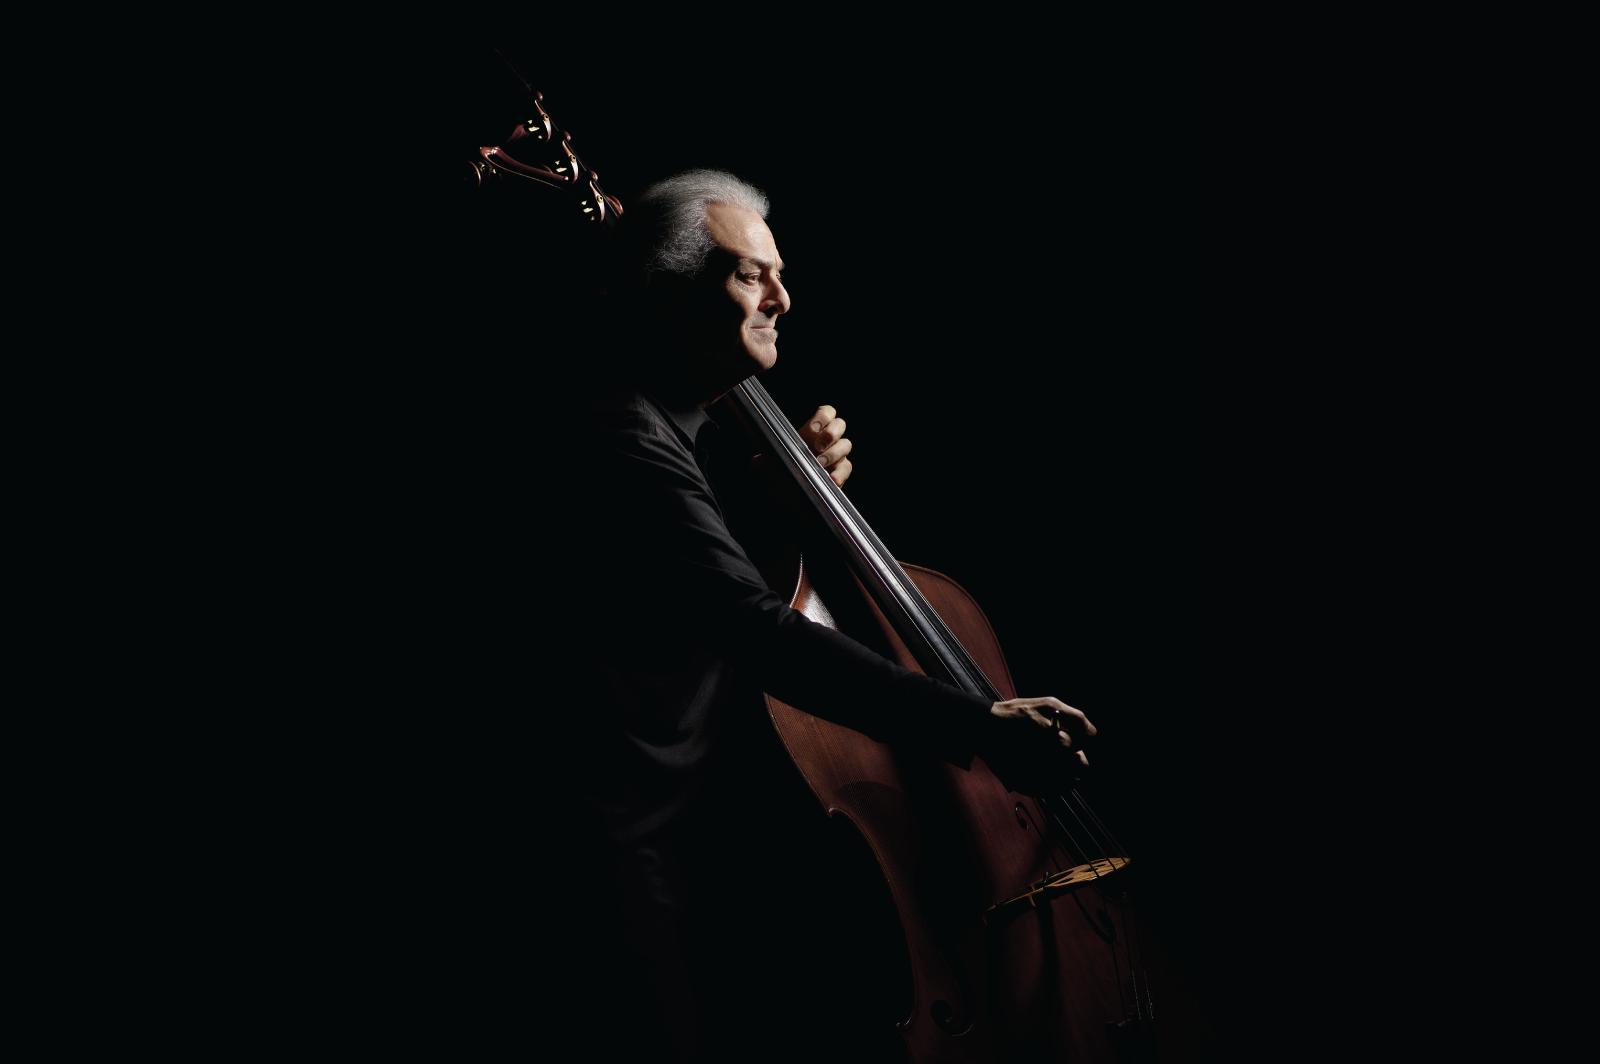 Orchestre Métropolitain - Karina Gauvin & Les Illuminations